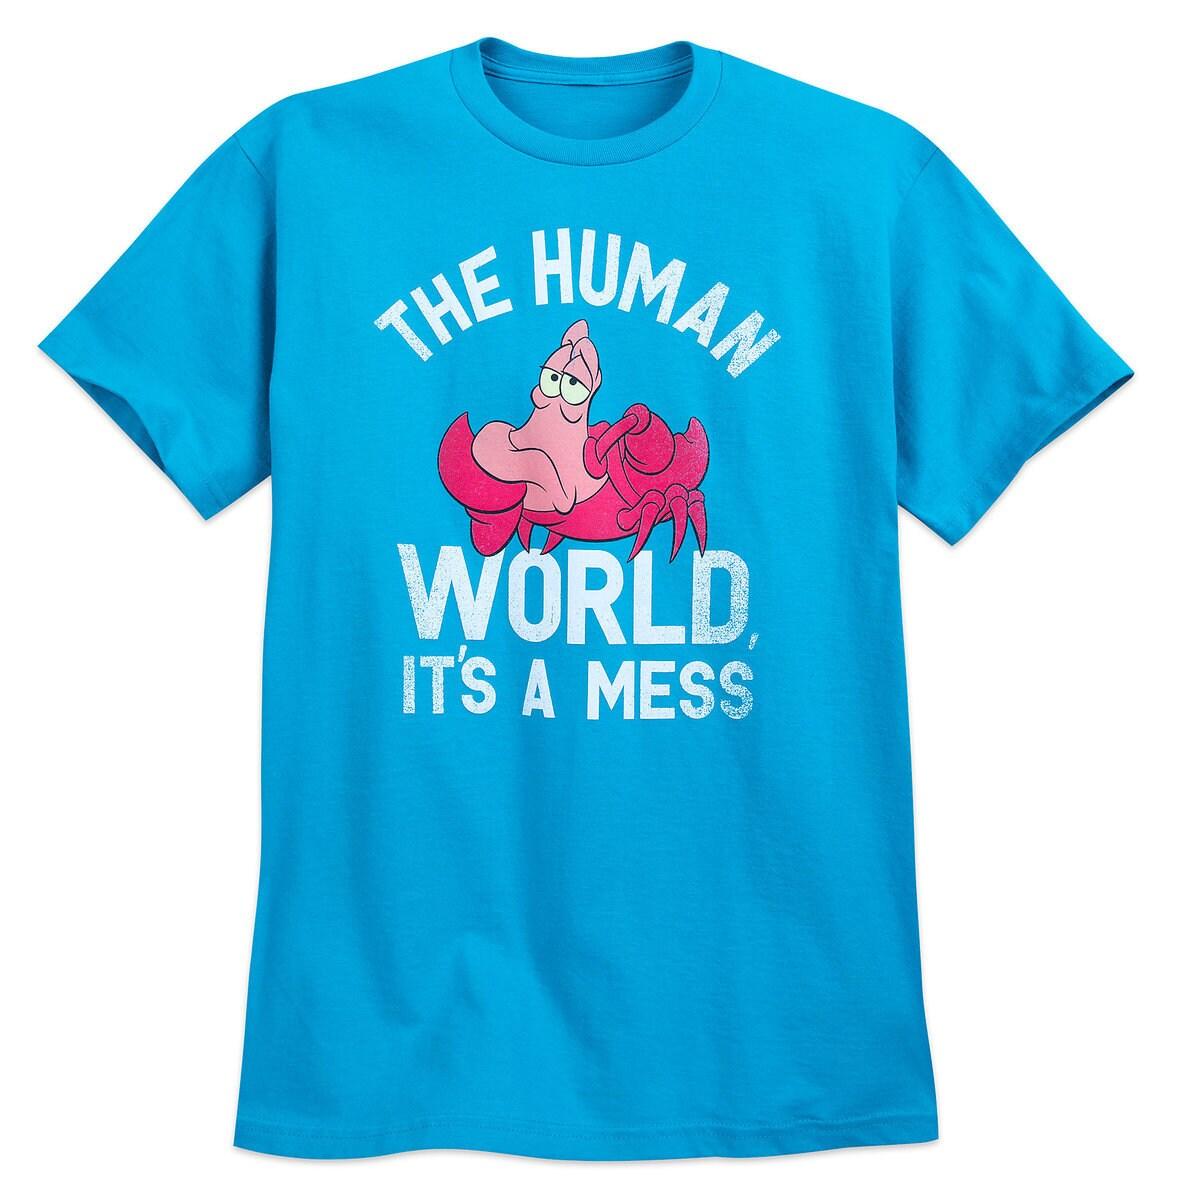 Sebastian T-Shirt for Adults - The Little Mermaid - Oh My Disney ...